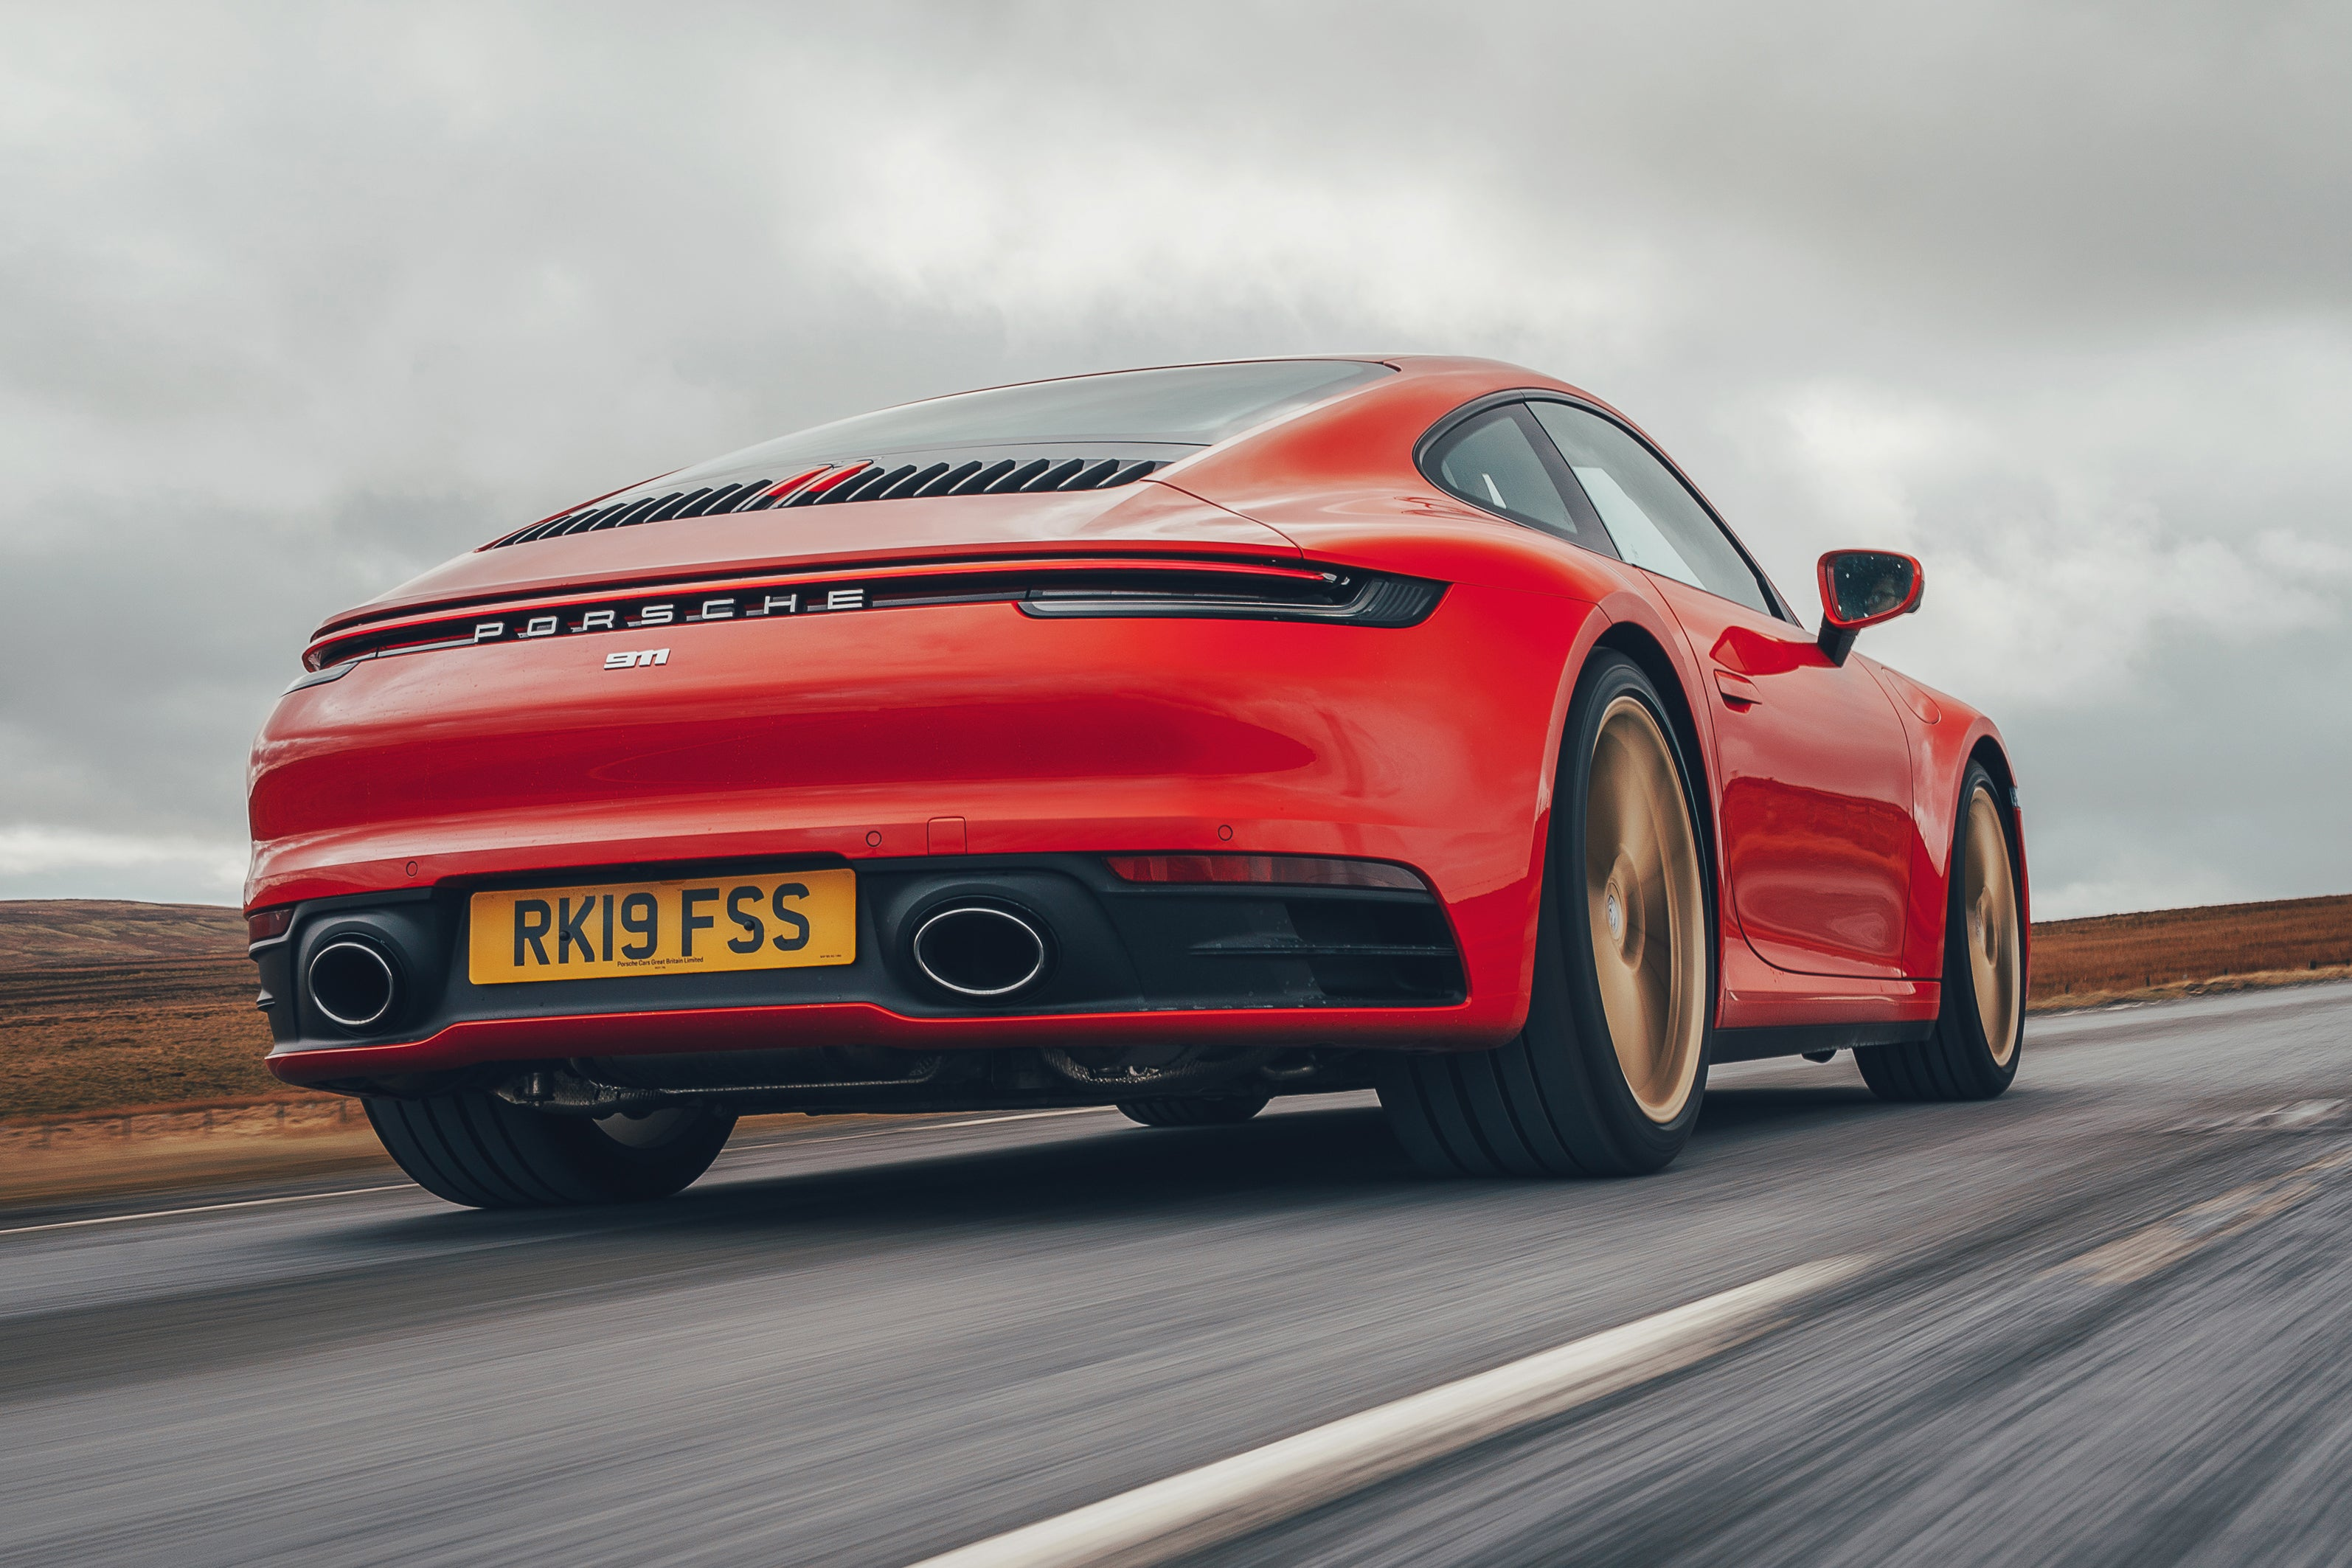 Porsche 911 Rear View